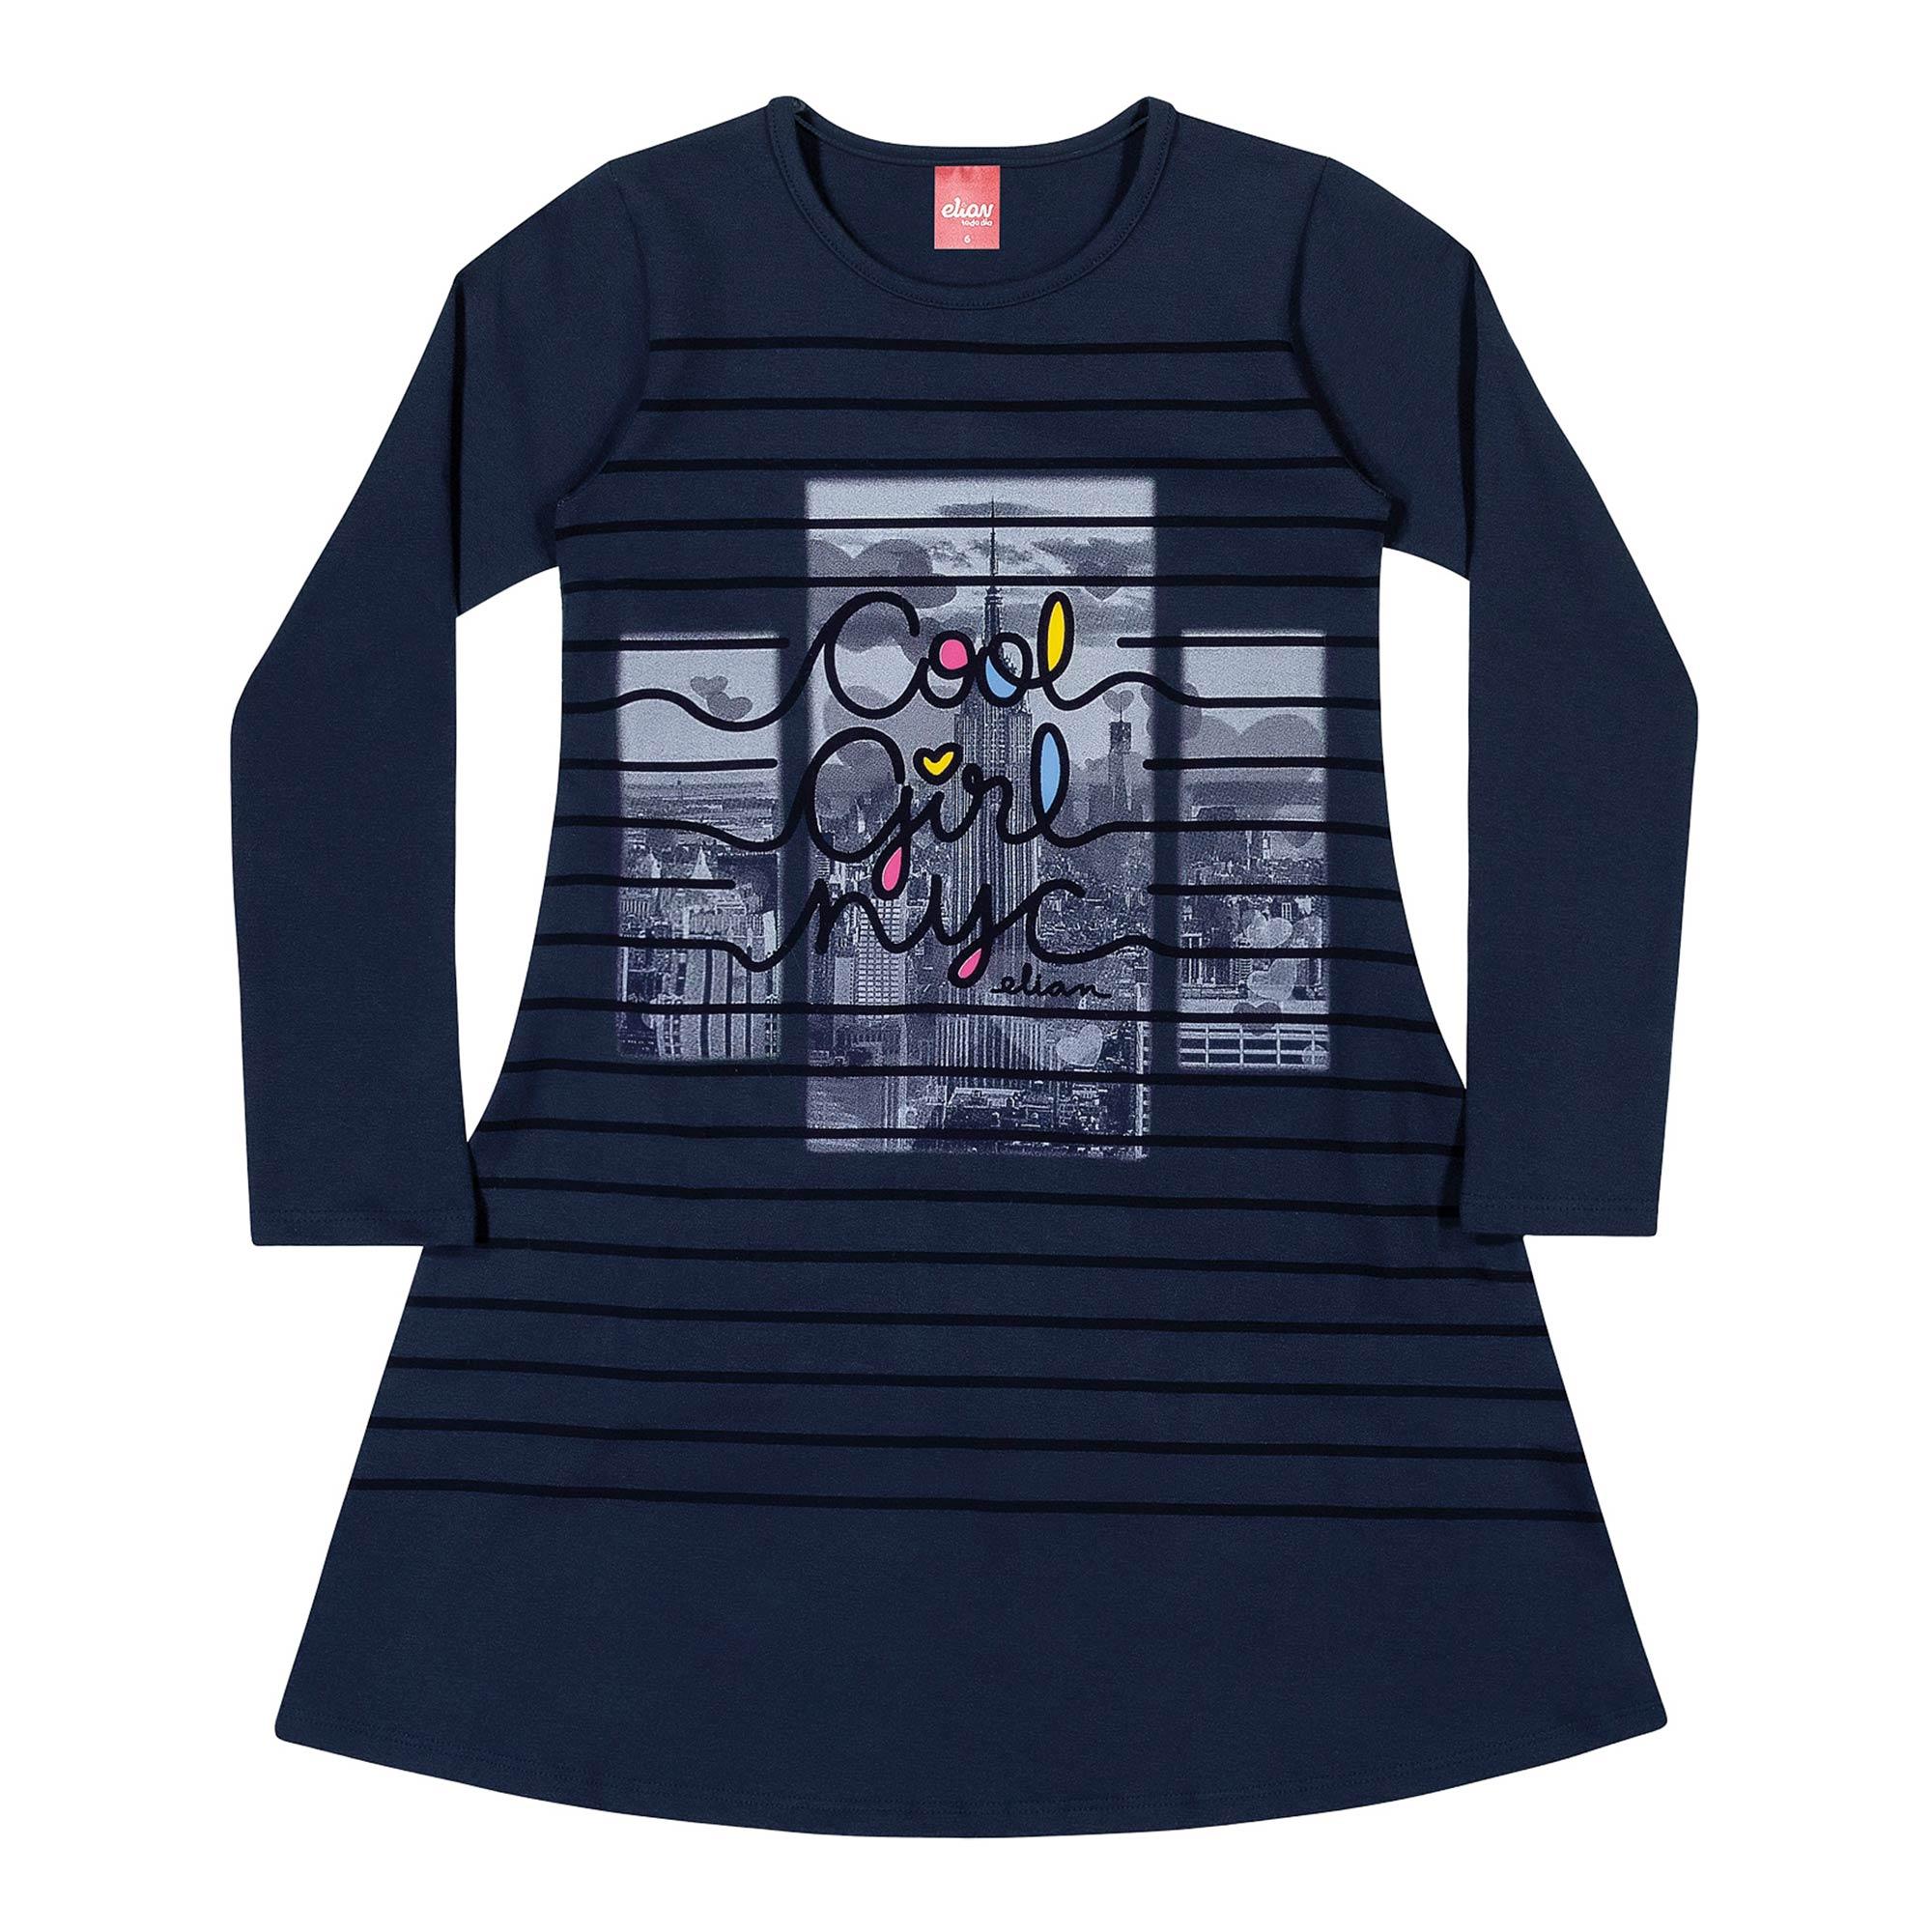 Vestido Infantil Elian - Ref 251165 - Marinho